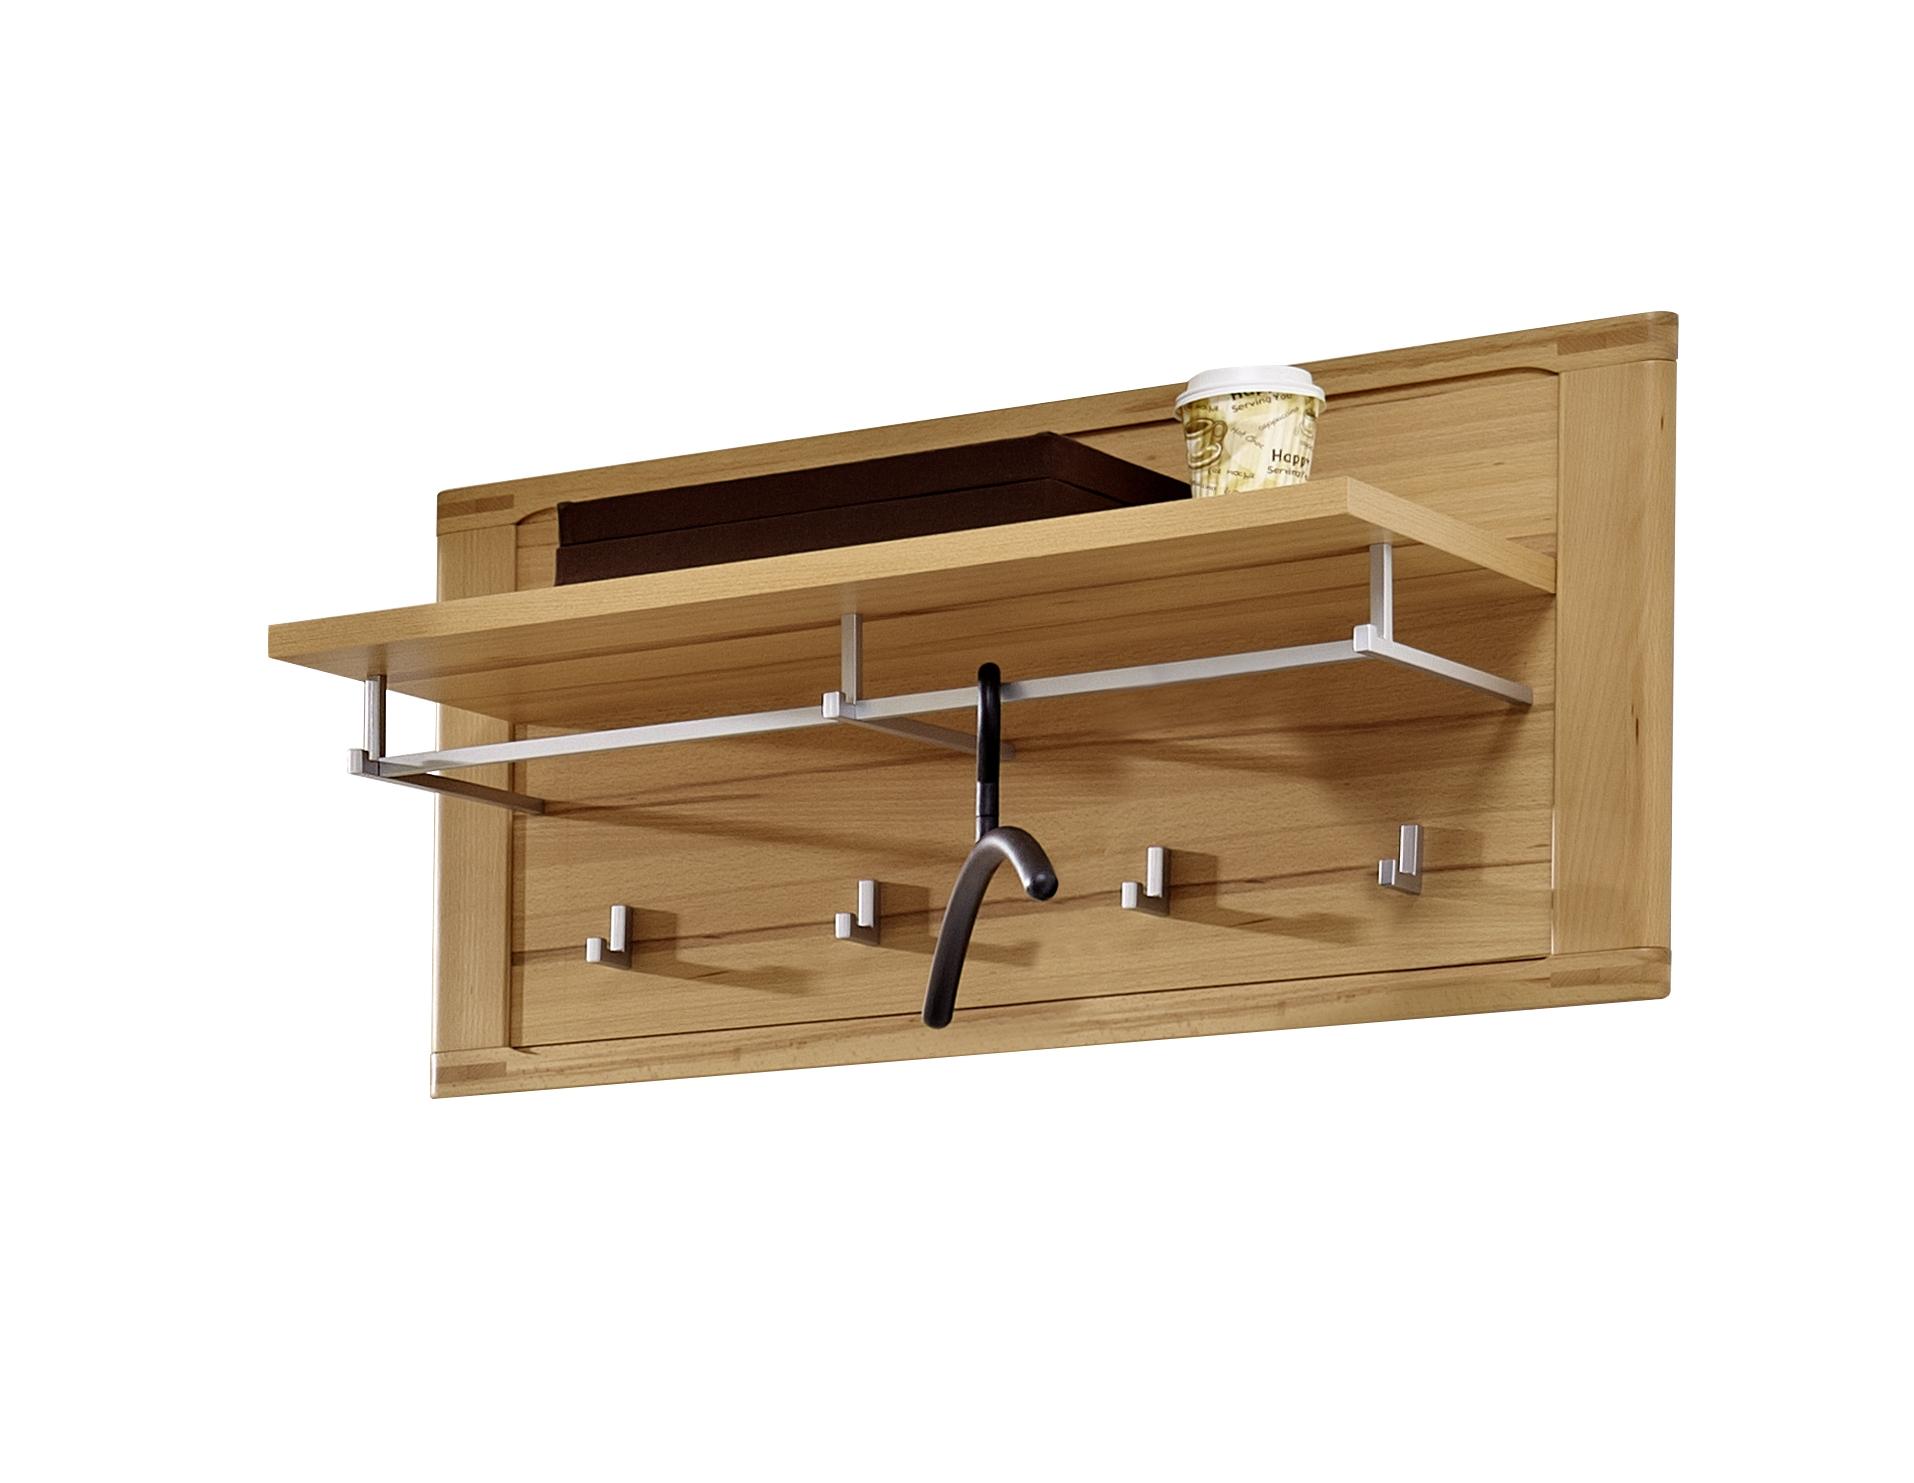 Cuier cu etajera din pal, Natur Plus, l90xA32xH45 cm